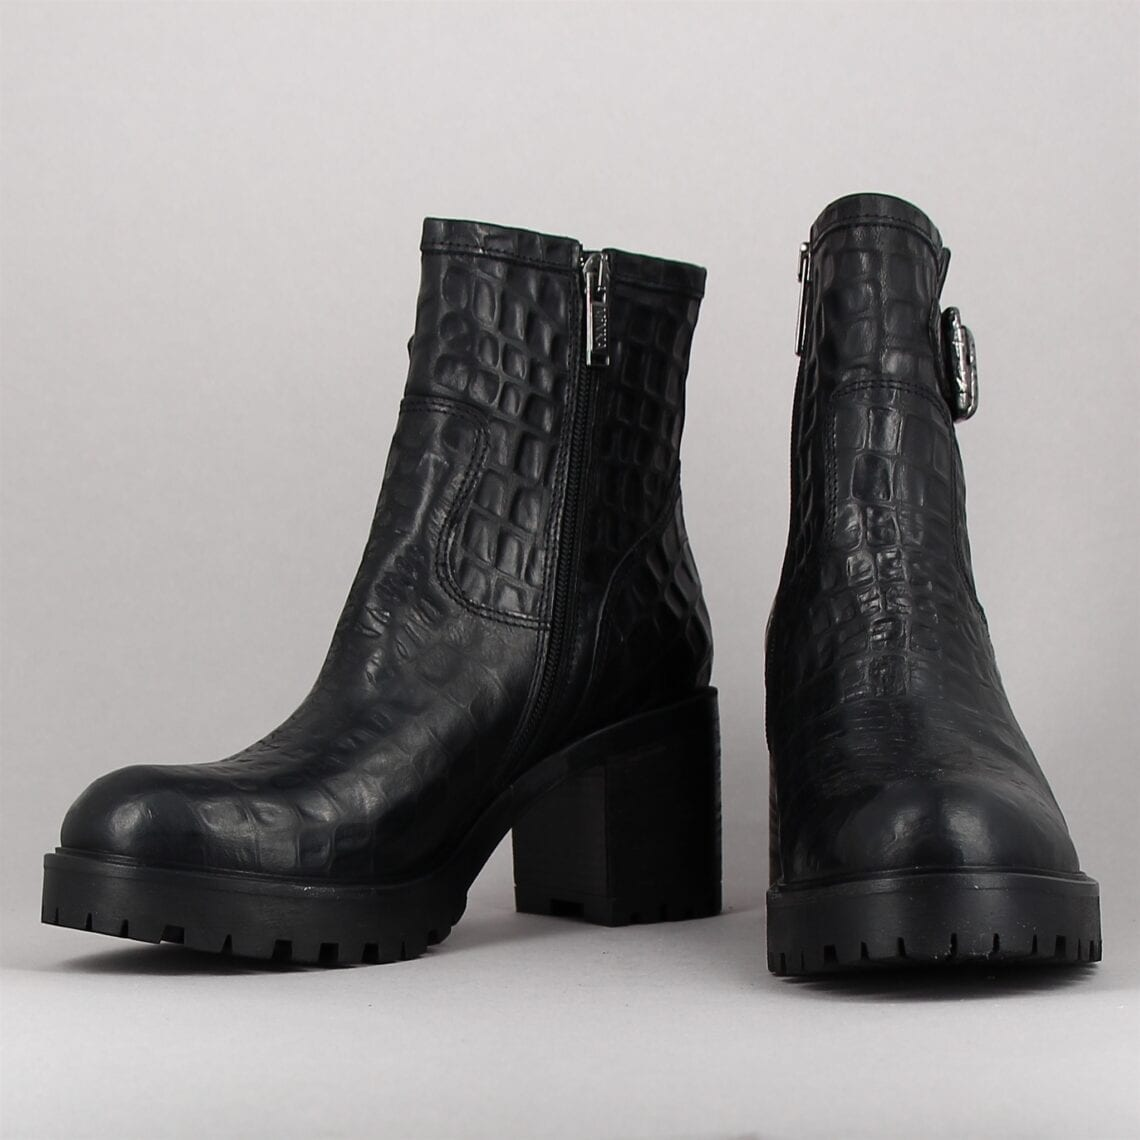 Design Boots phila 2 ⋆ Minka kuTwOXPZi